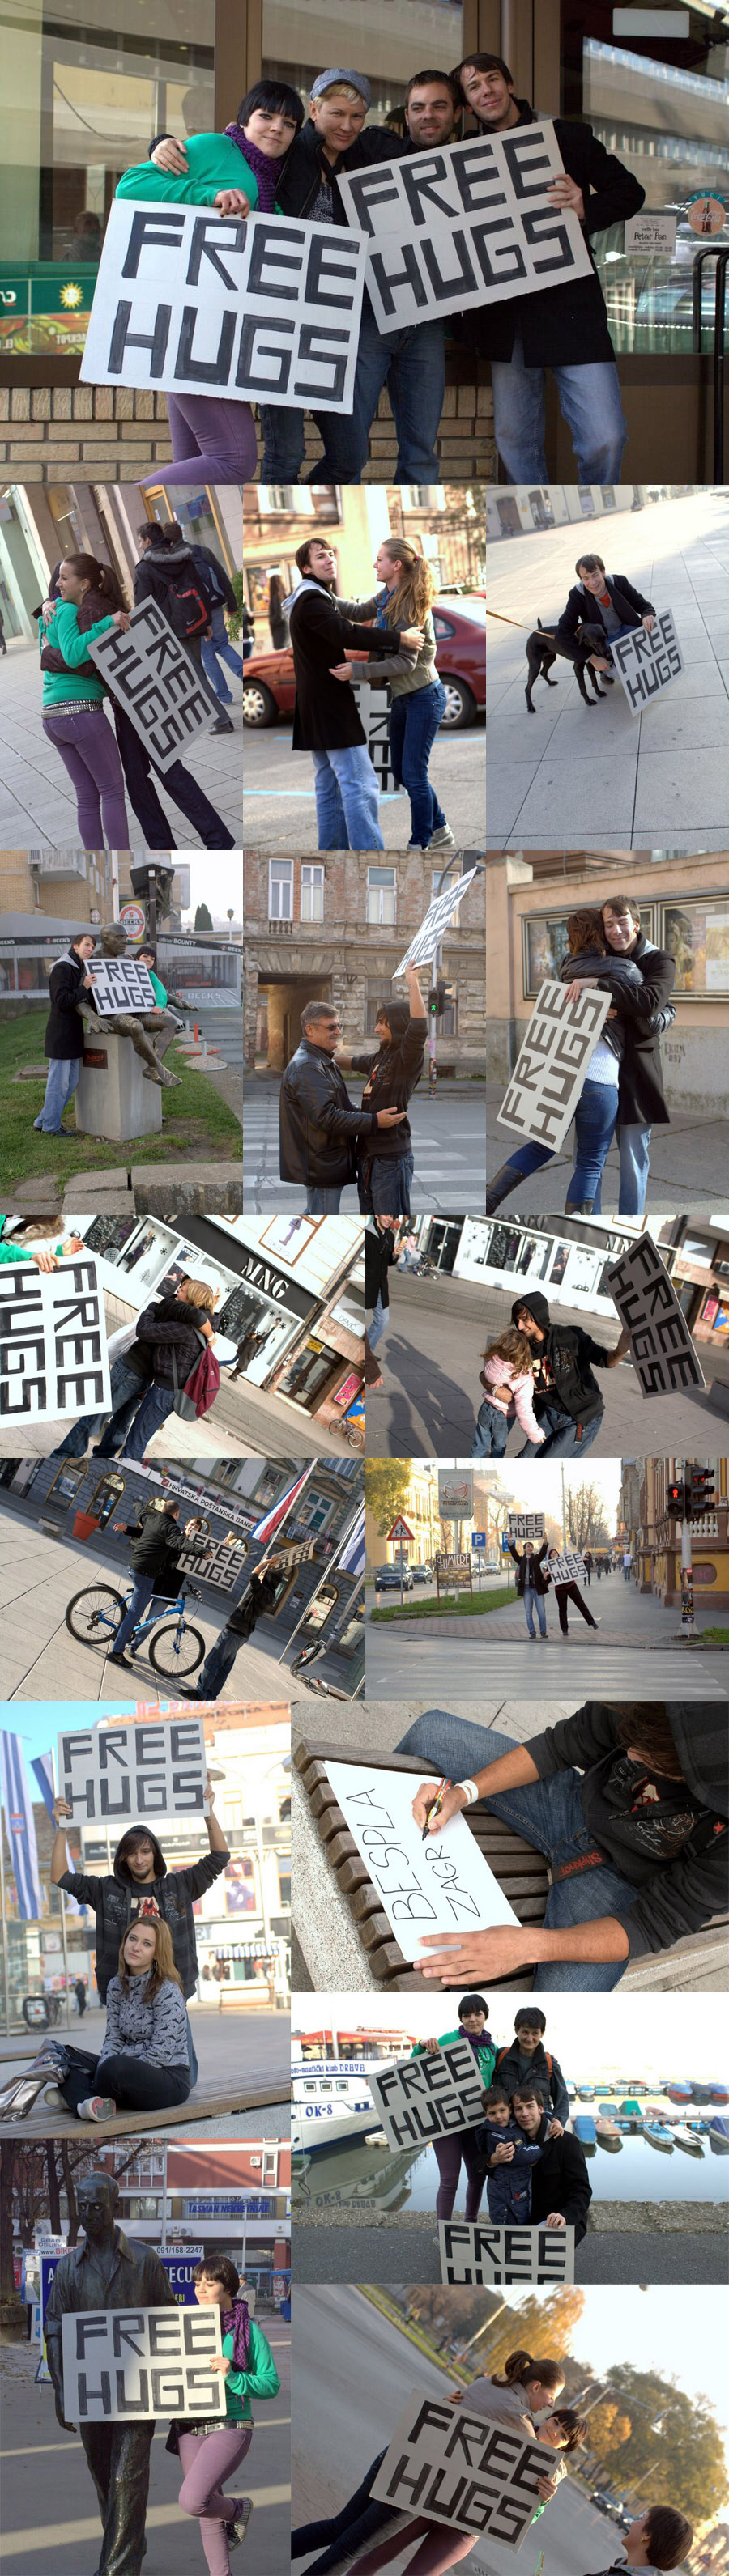 'Free Hugs' day  [url=http://www.osijek031.com/osijek.php?najava_id=22548]Trg: 'Free Hugs' day[/url]  Foto: [b]Igor Košćak[/b]  Ključne riječi: free-hugs